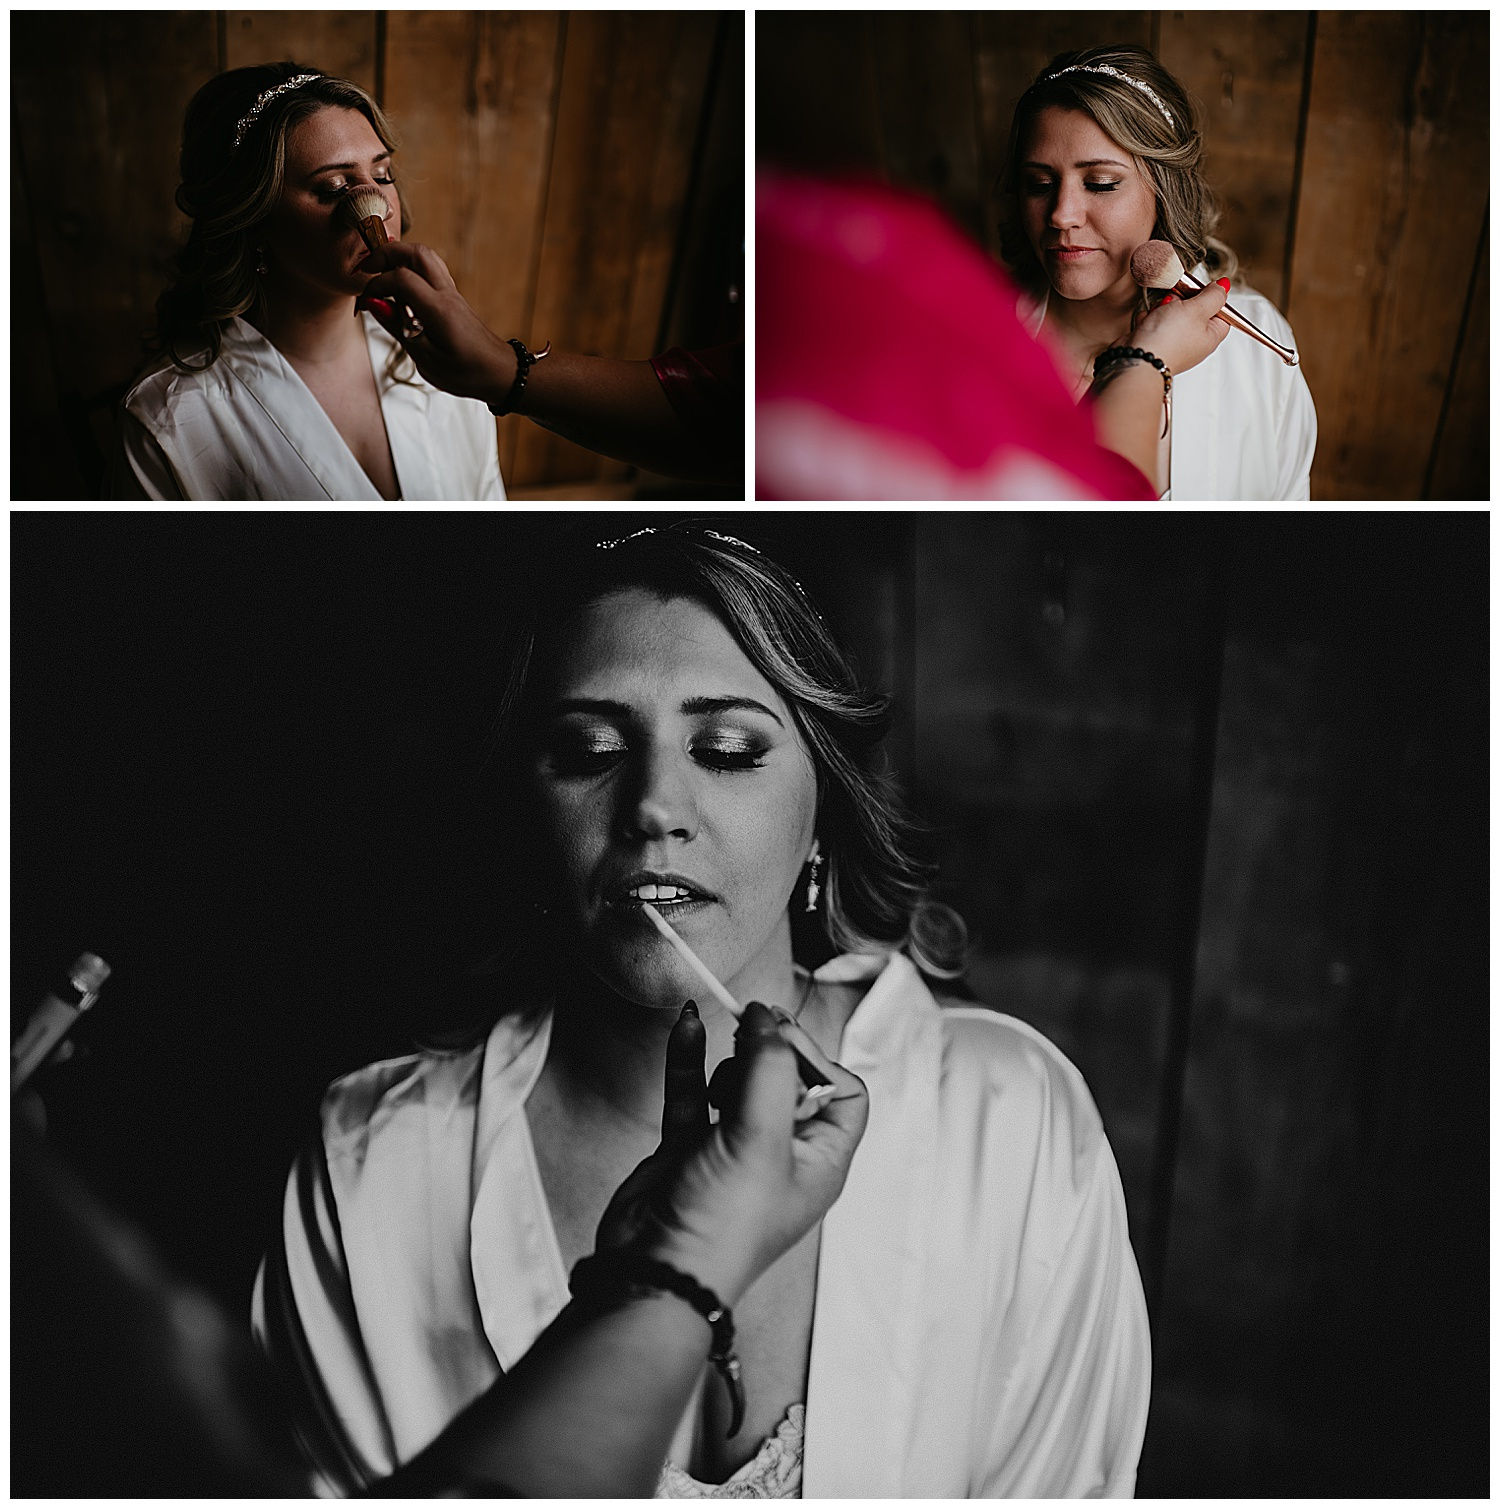 NEPA-Bloomgsburg-Wedding-Photographer-at-The-Barn-at-Greystone-Farms-Watsontown-PA_0010.jpg